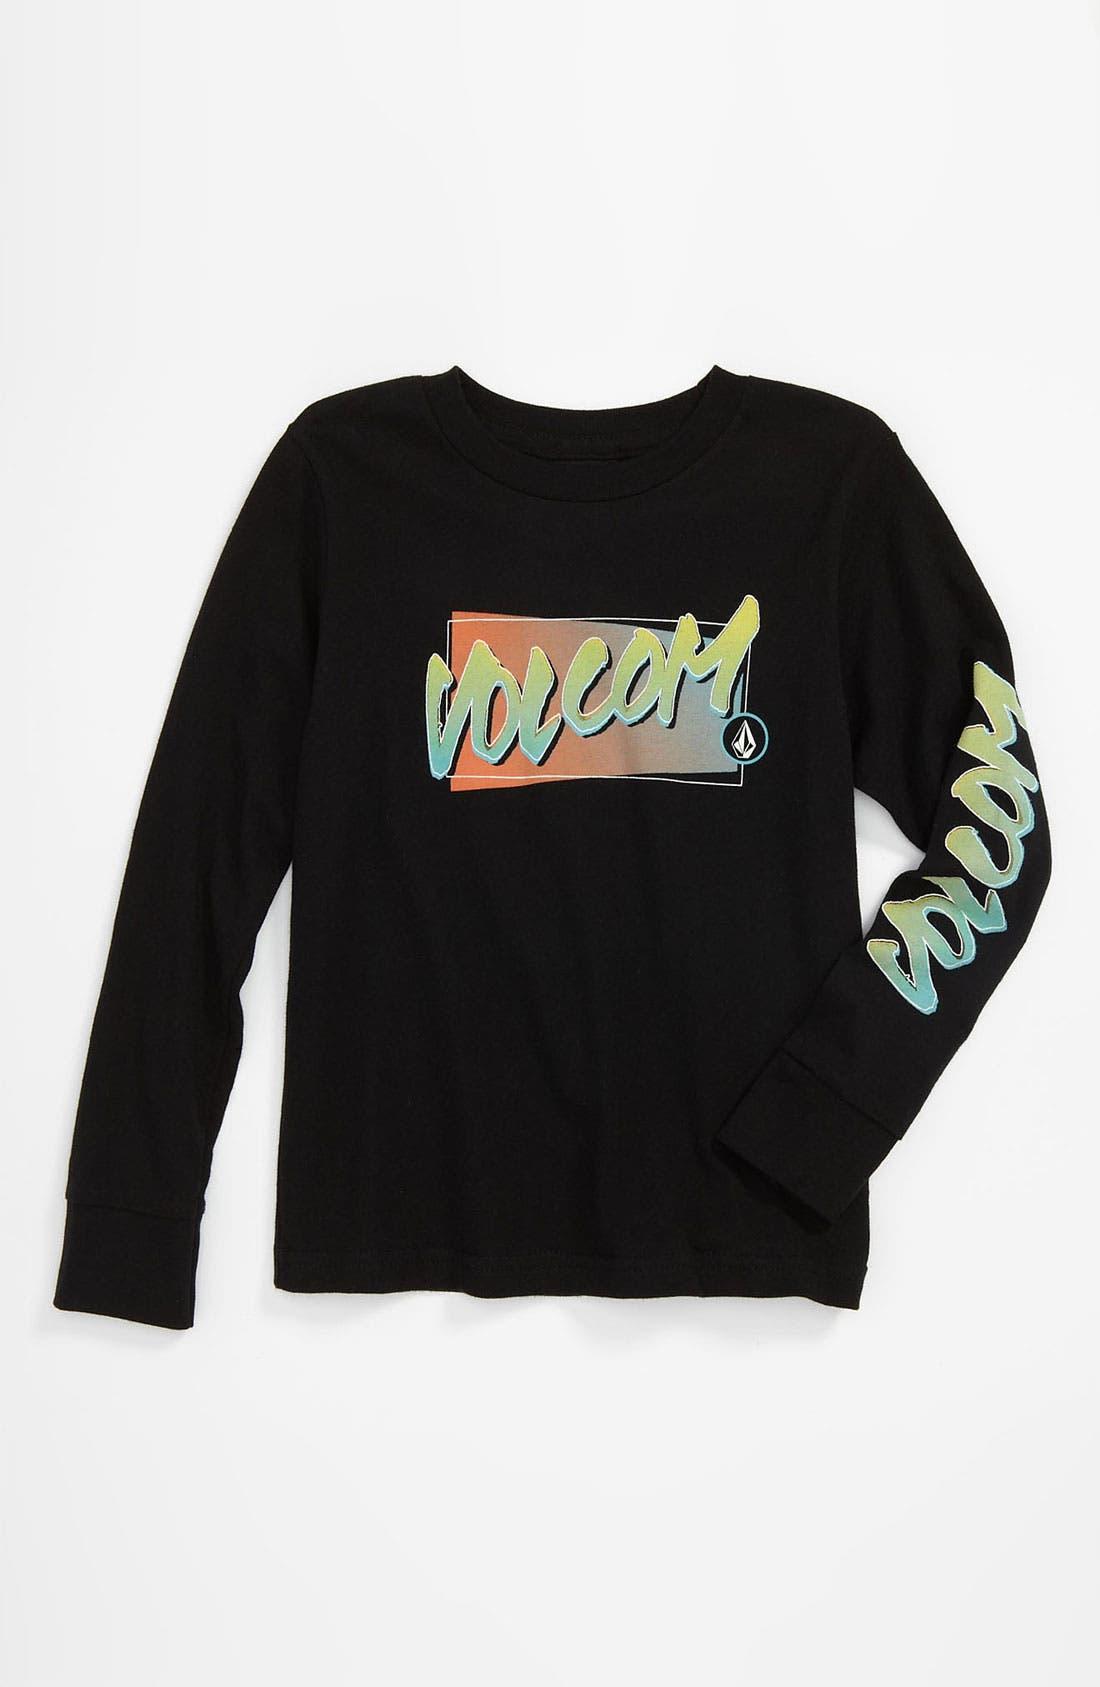 Alternate Image 1 Selected - Volcom 'Core' T-Shirt (Big Boys)